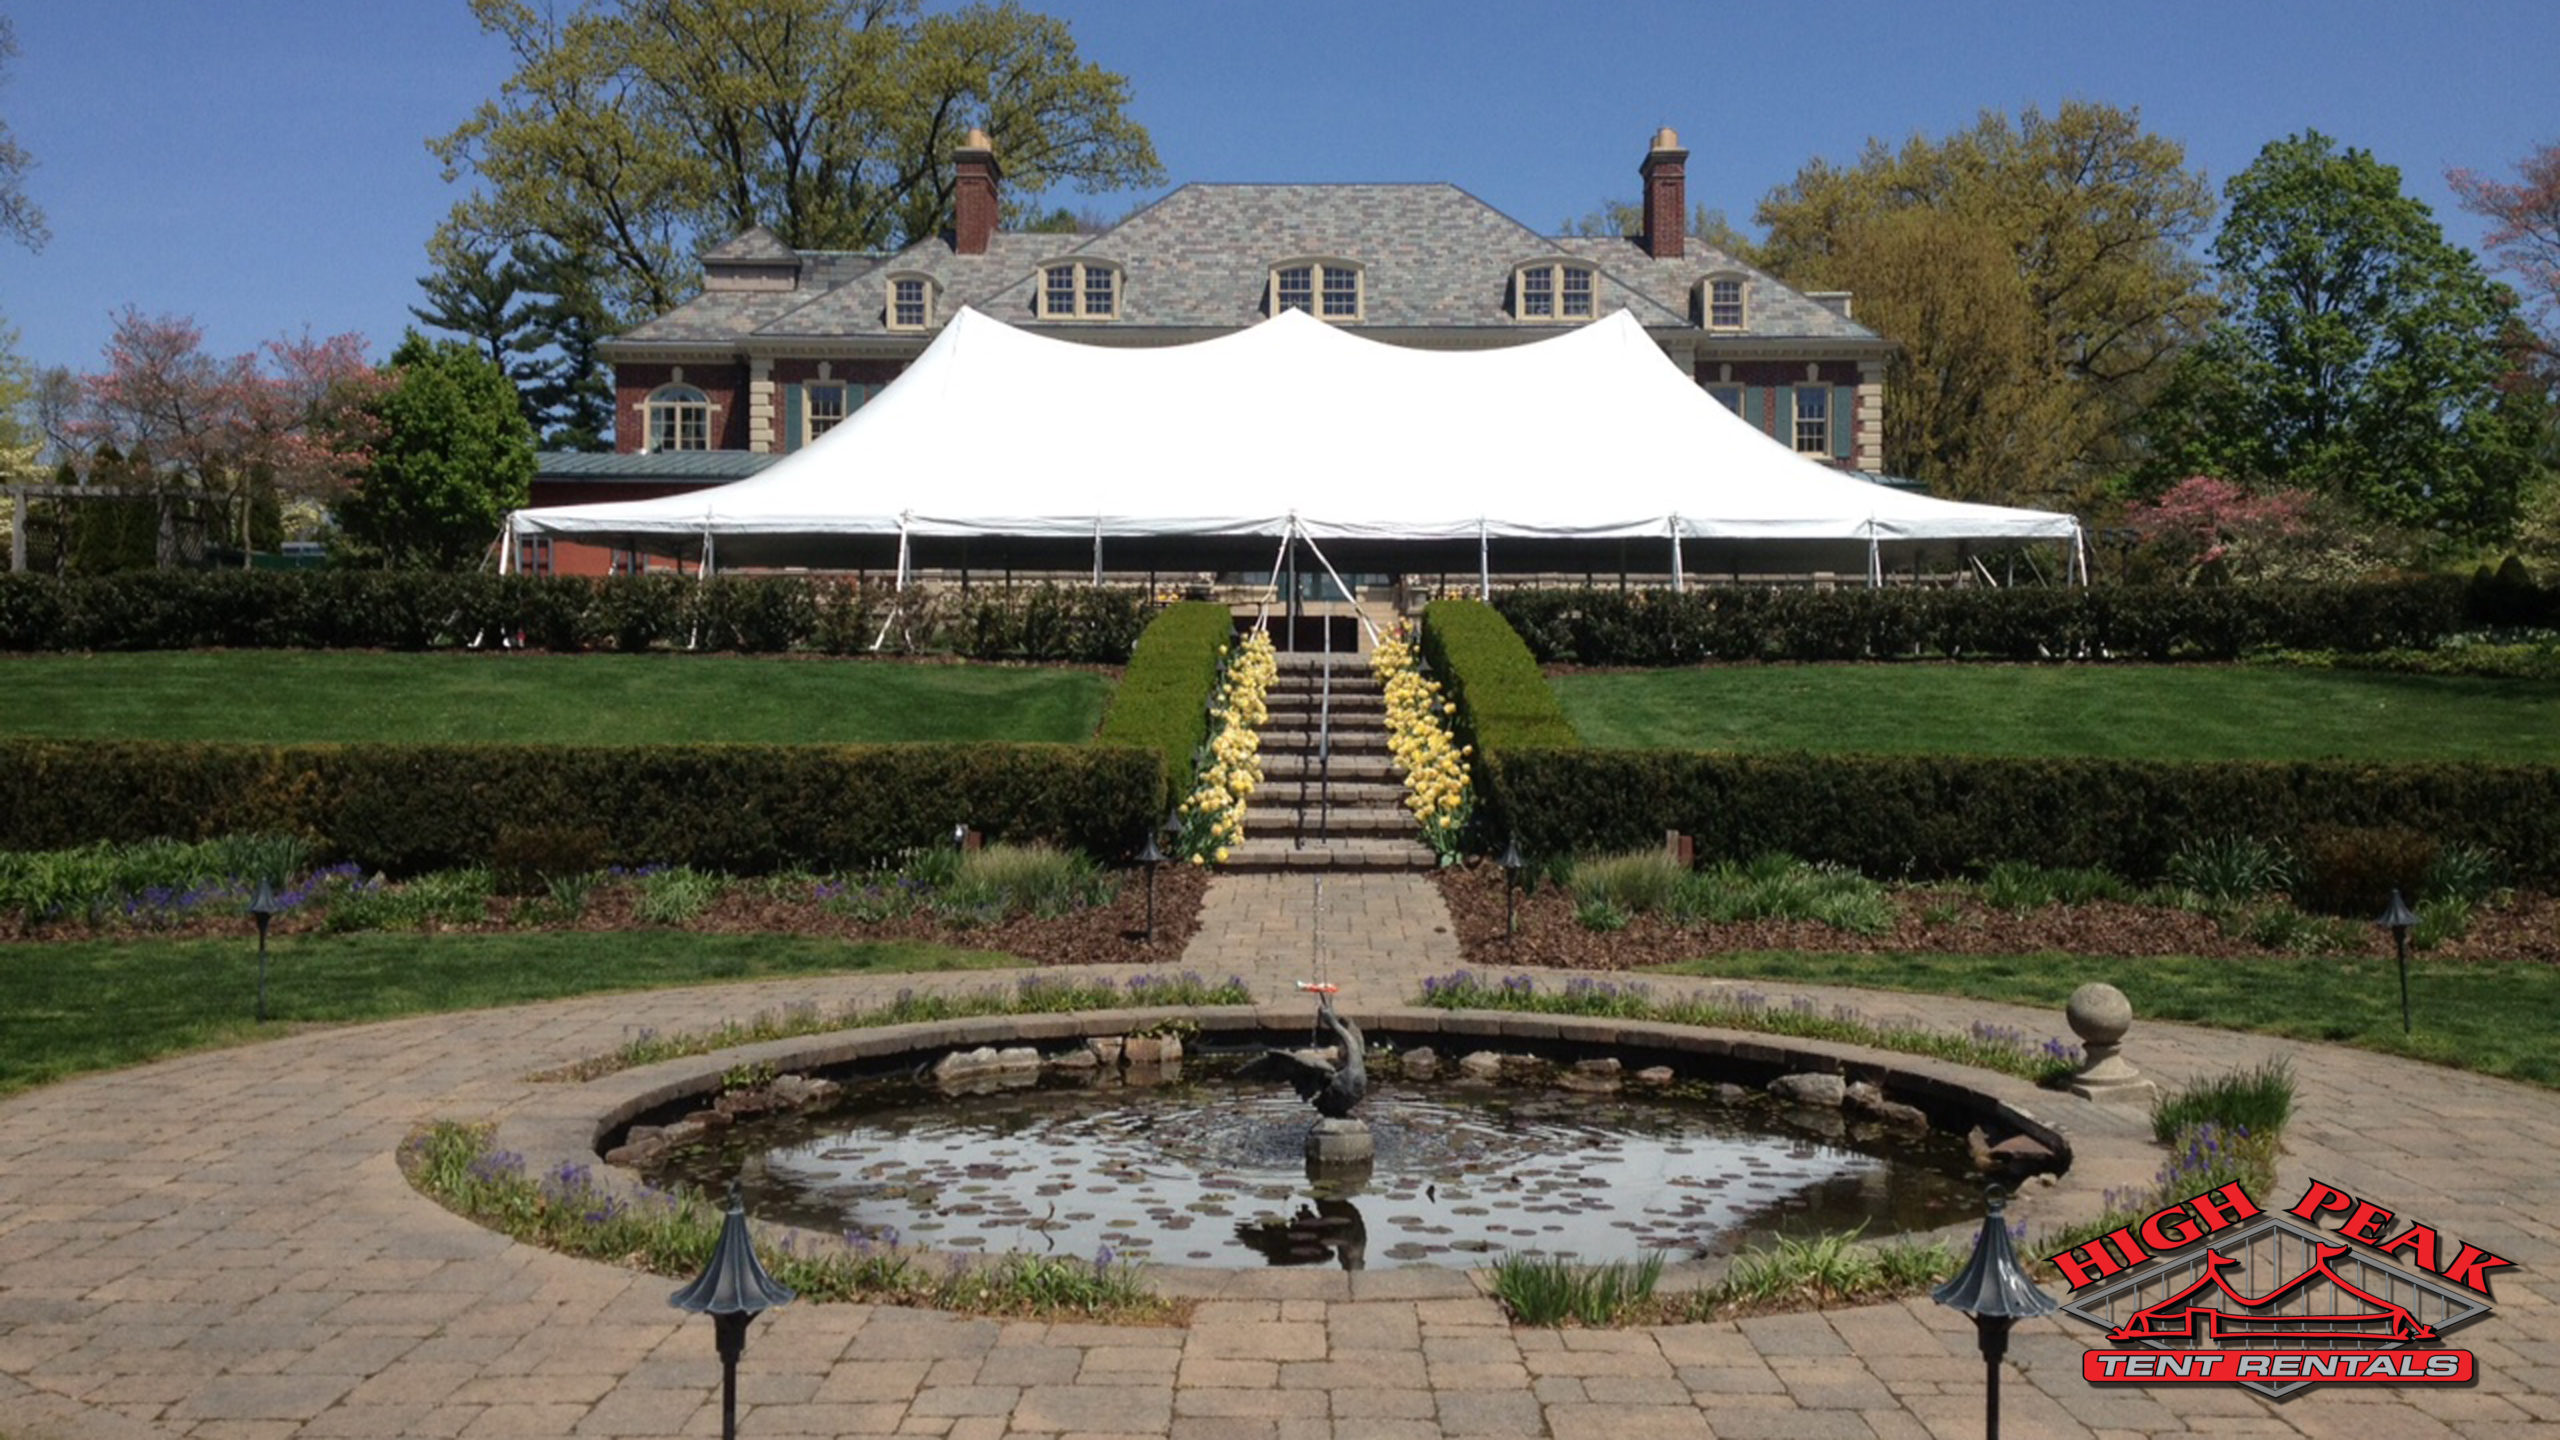 Image of Wedding Tent